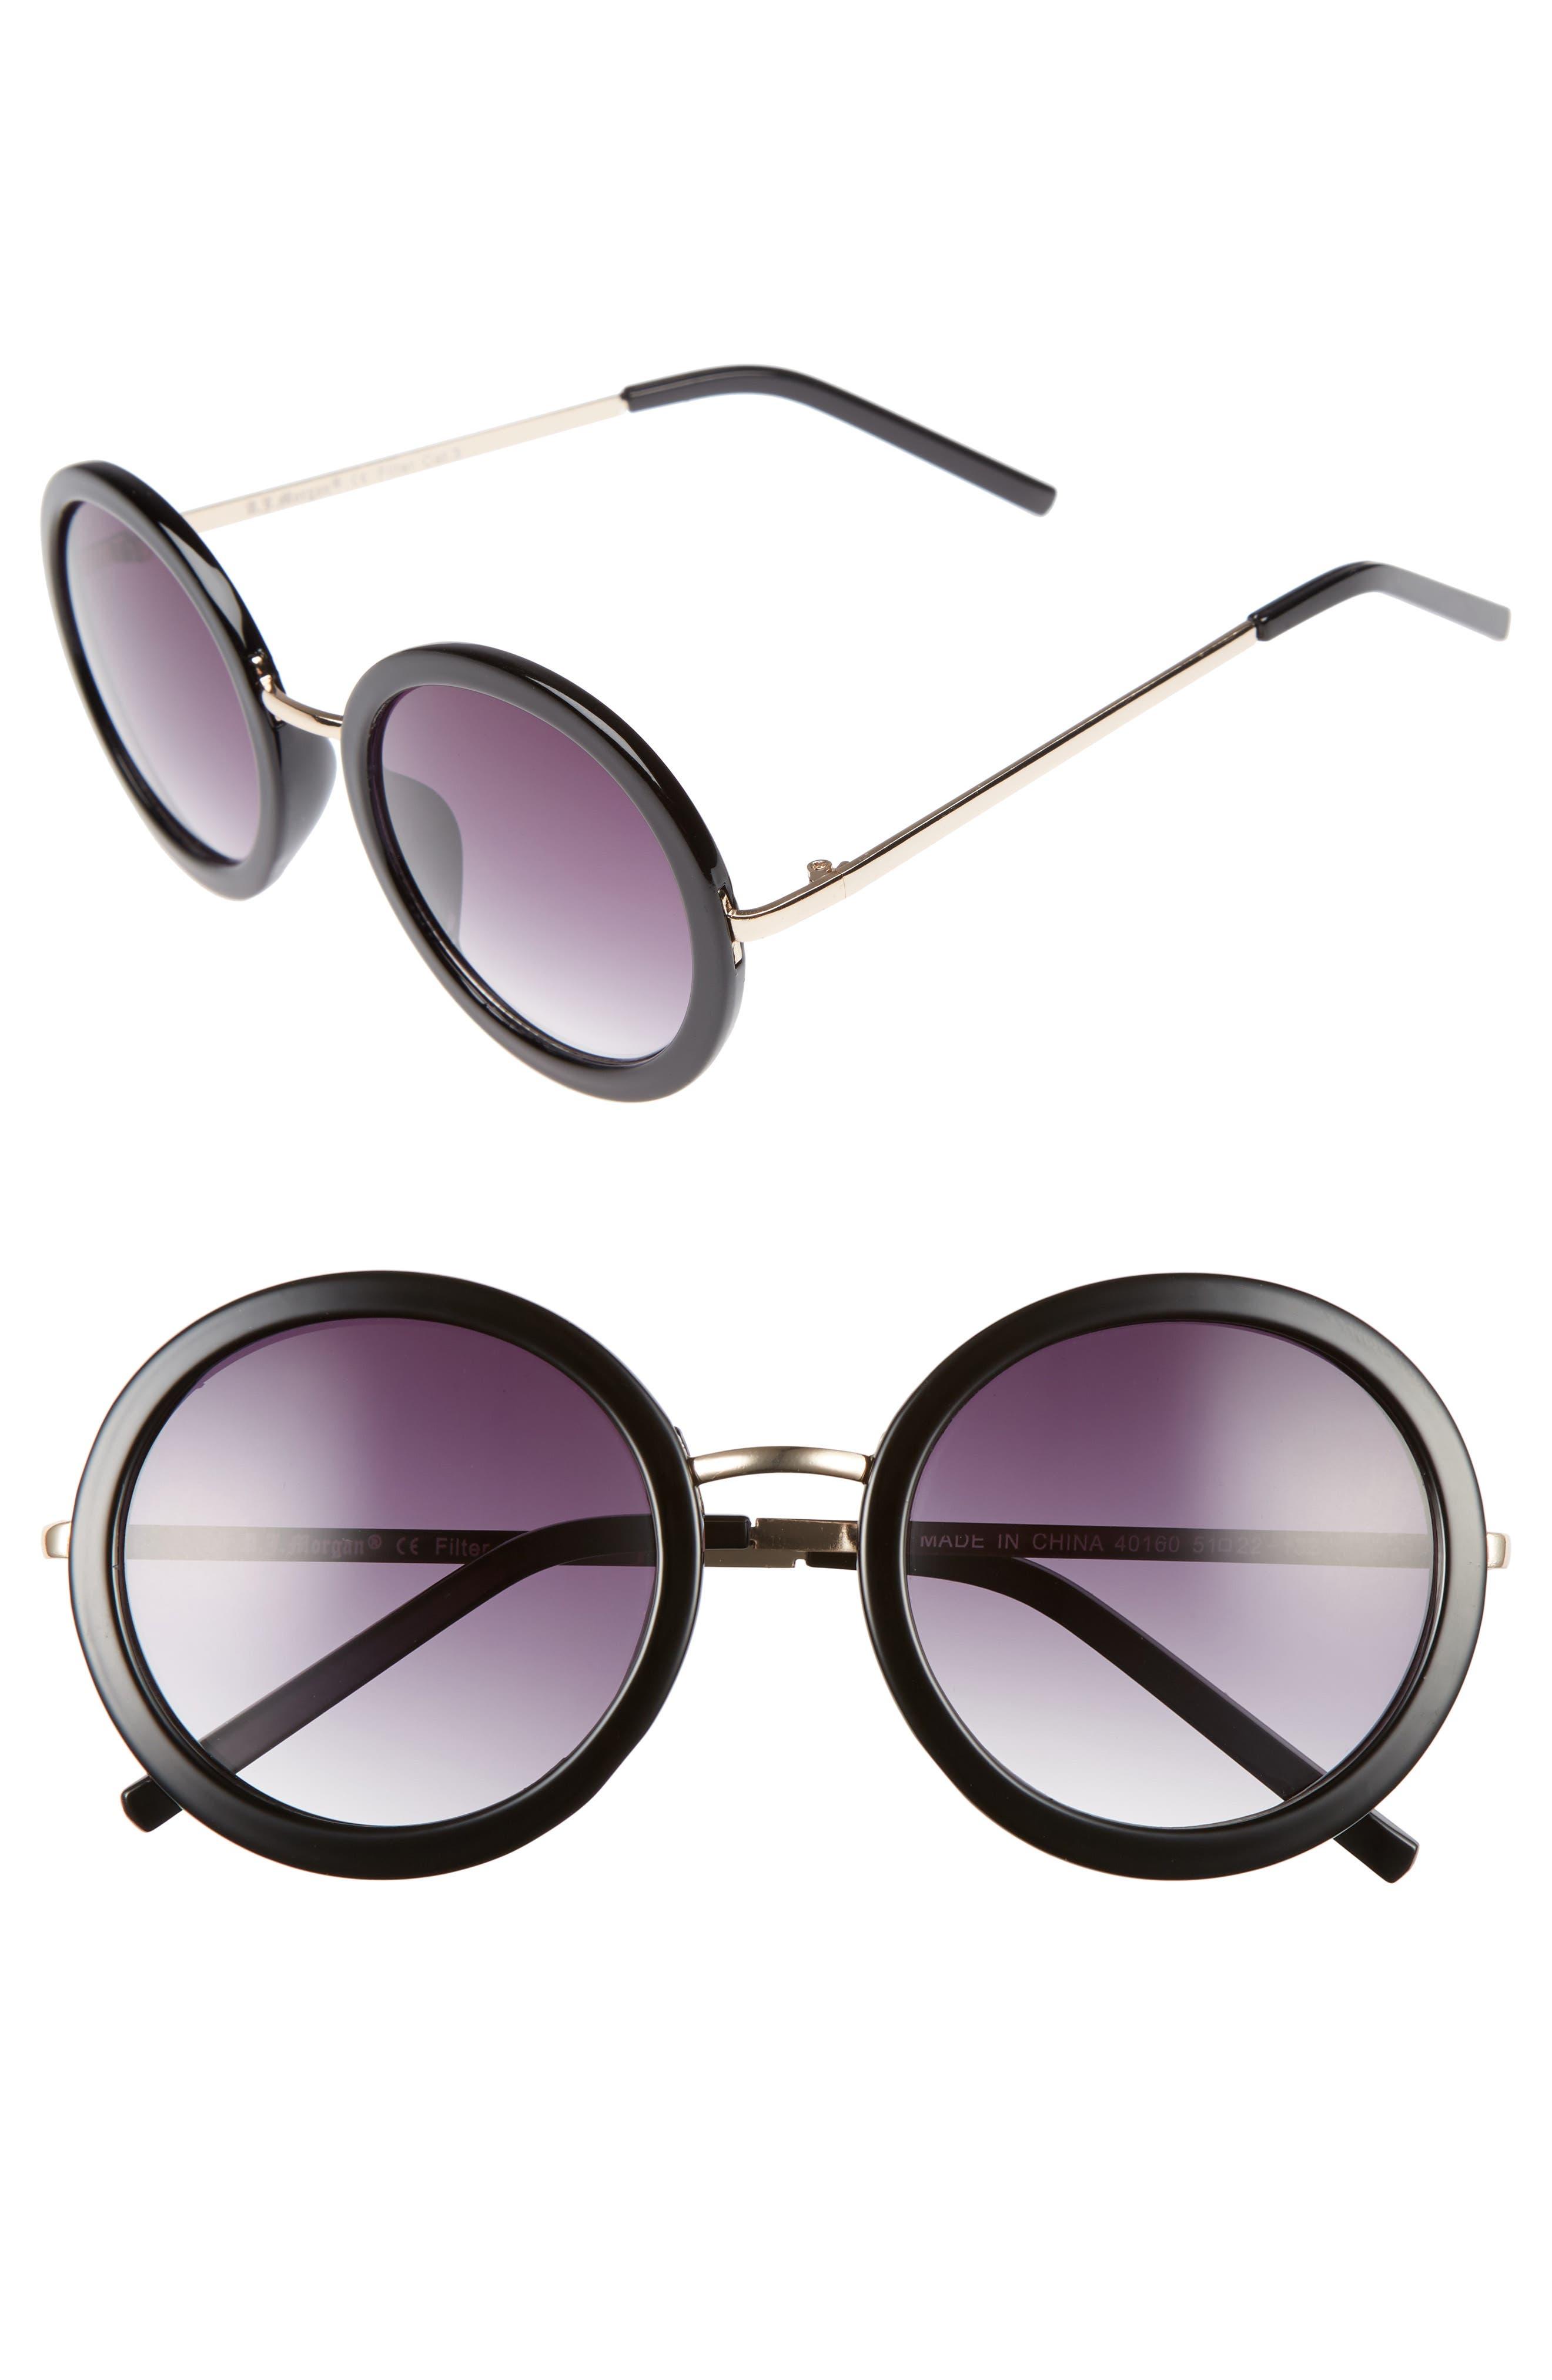 Main Image - A.J. Morgan 51mm Round Sunglasses